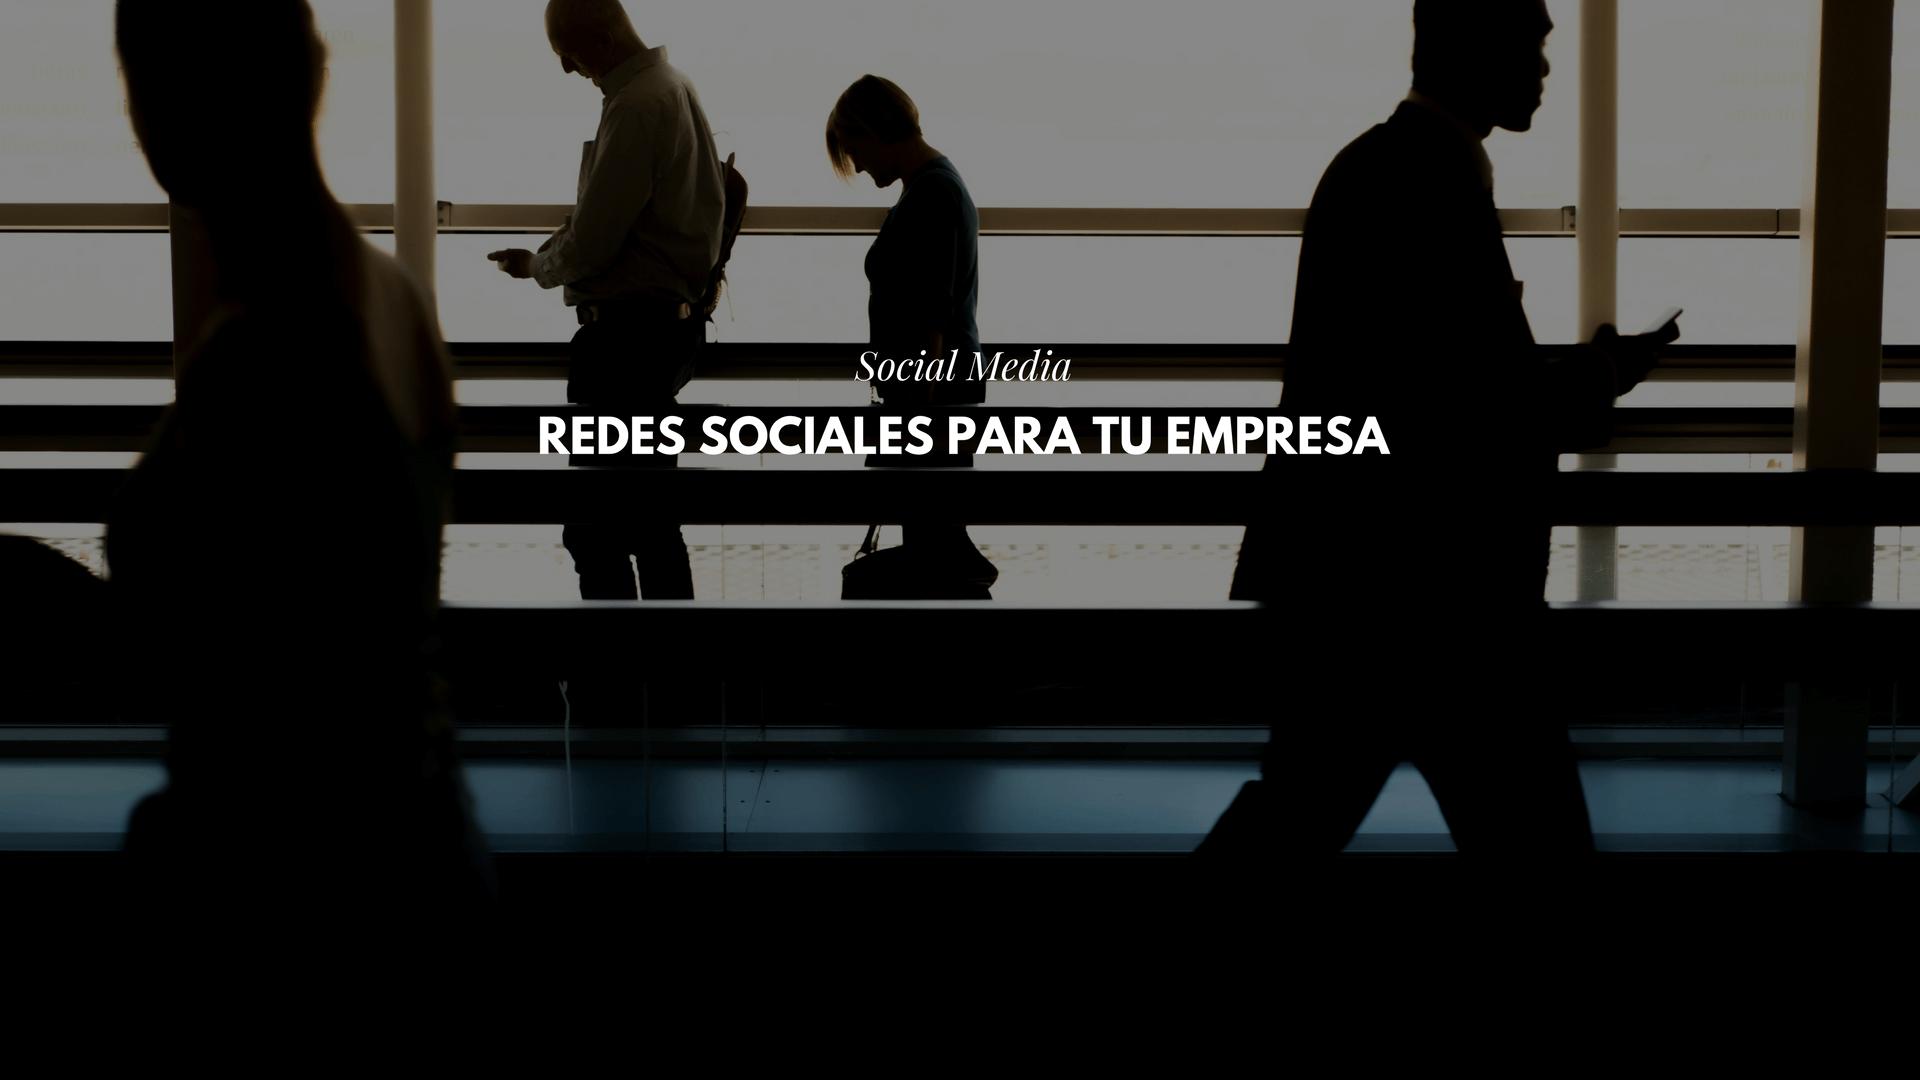 Social Media: Redes Sociales para tu empresa